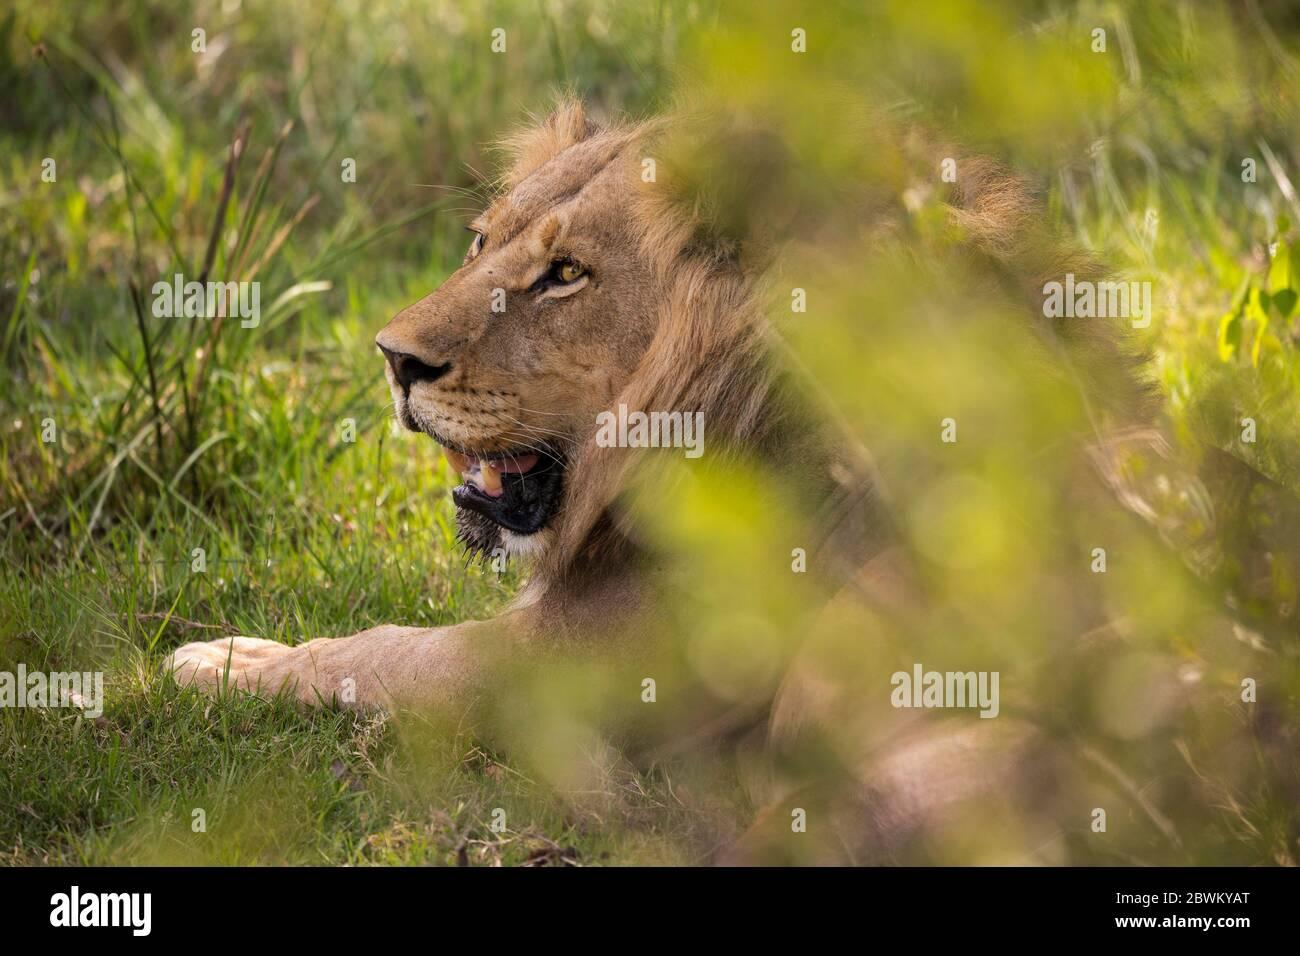 A large male lion, Panthera leo, resting. Stock Photo